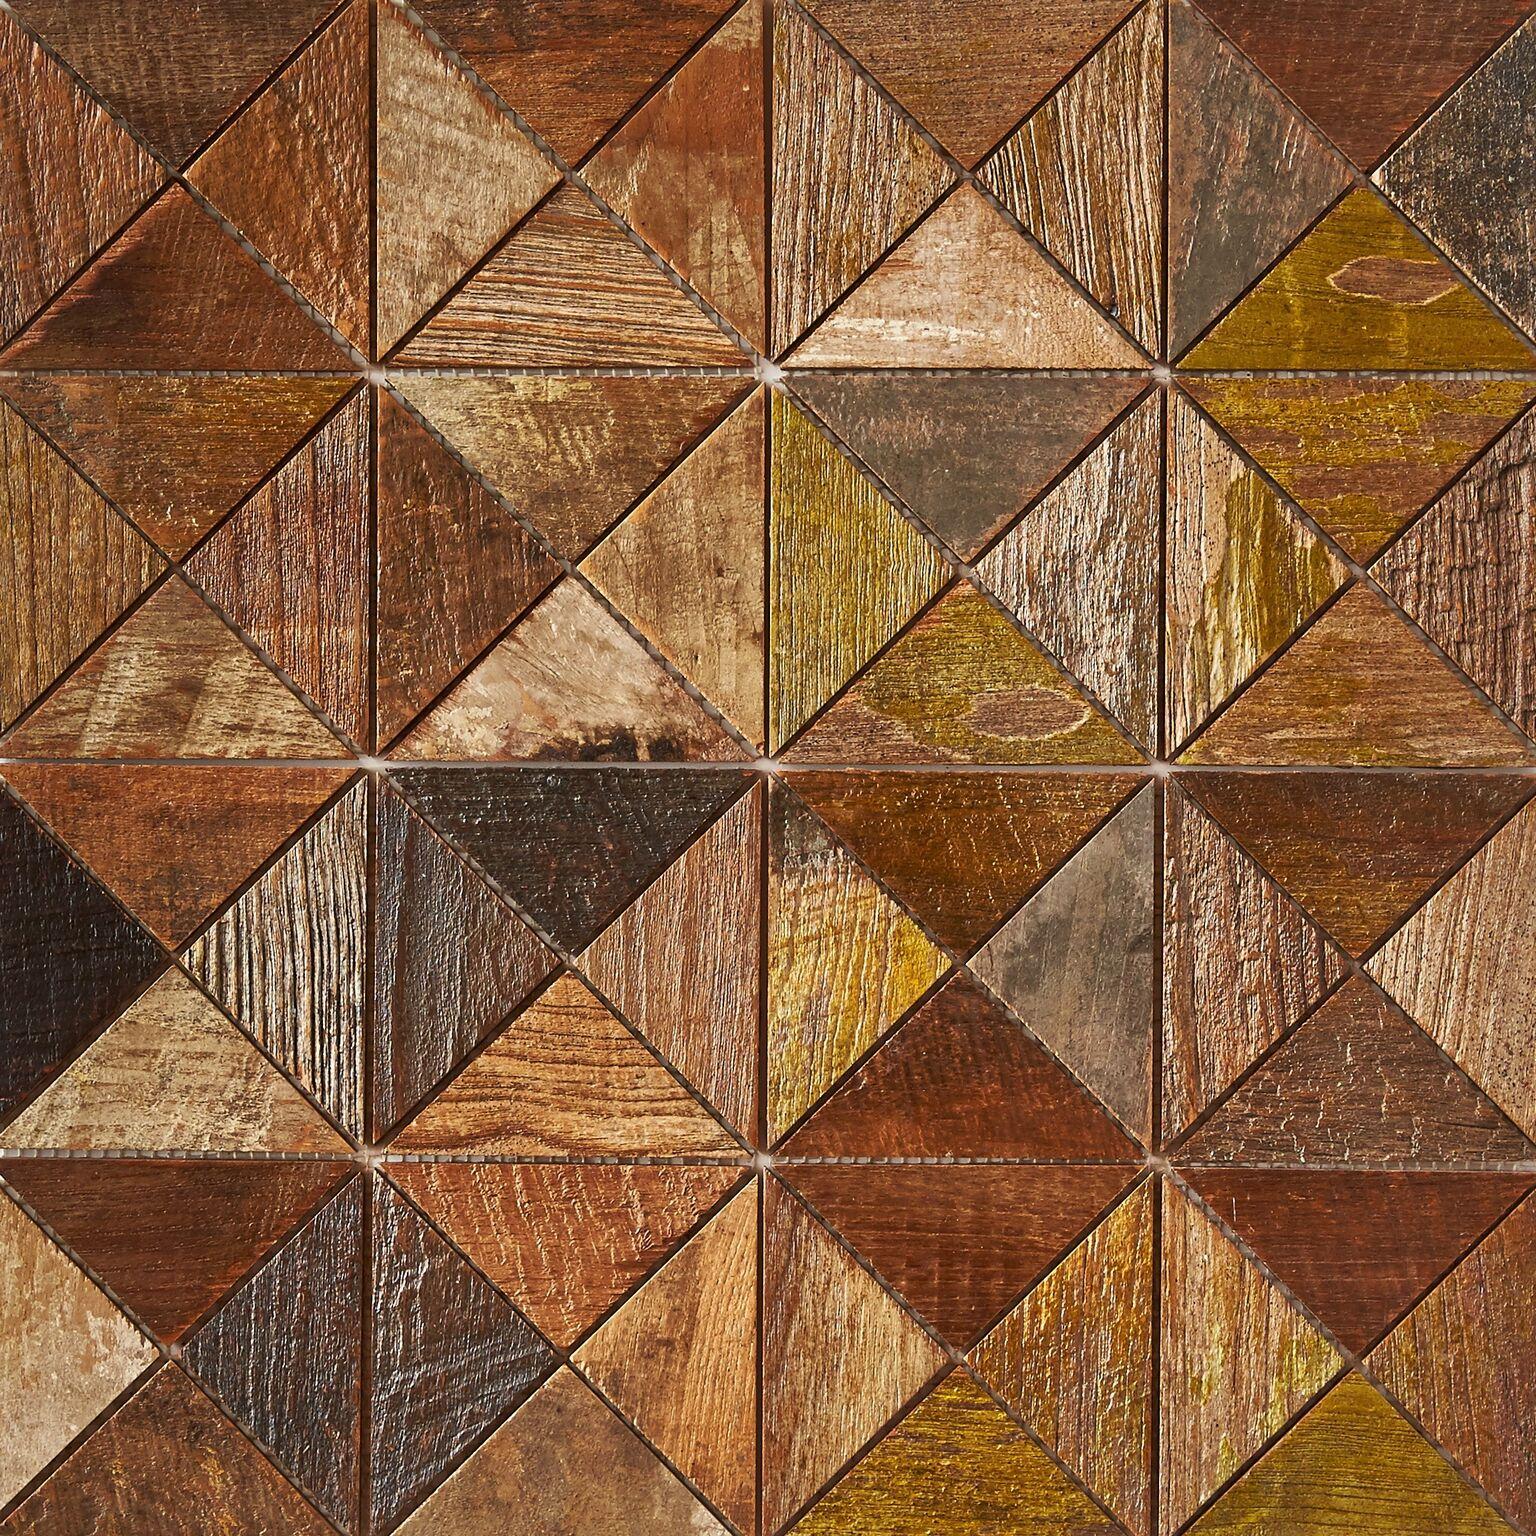 patina matte finish 8 - Teak Tile - Crosscut